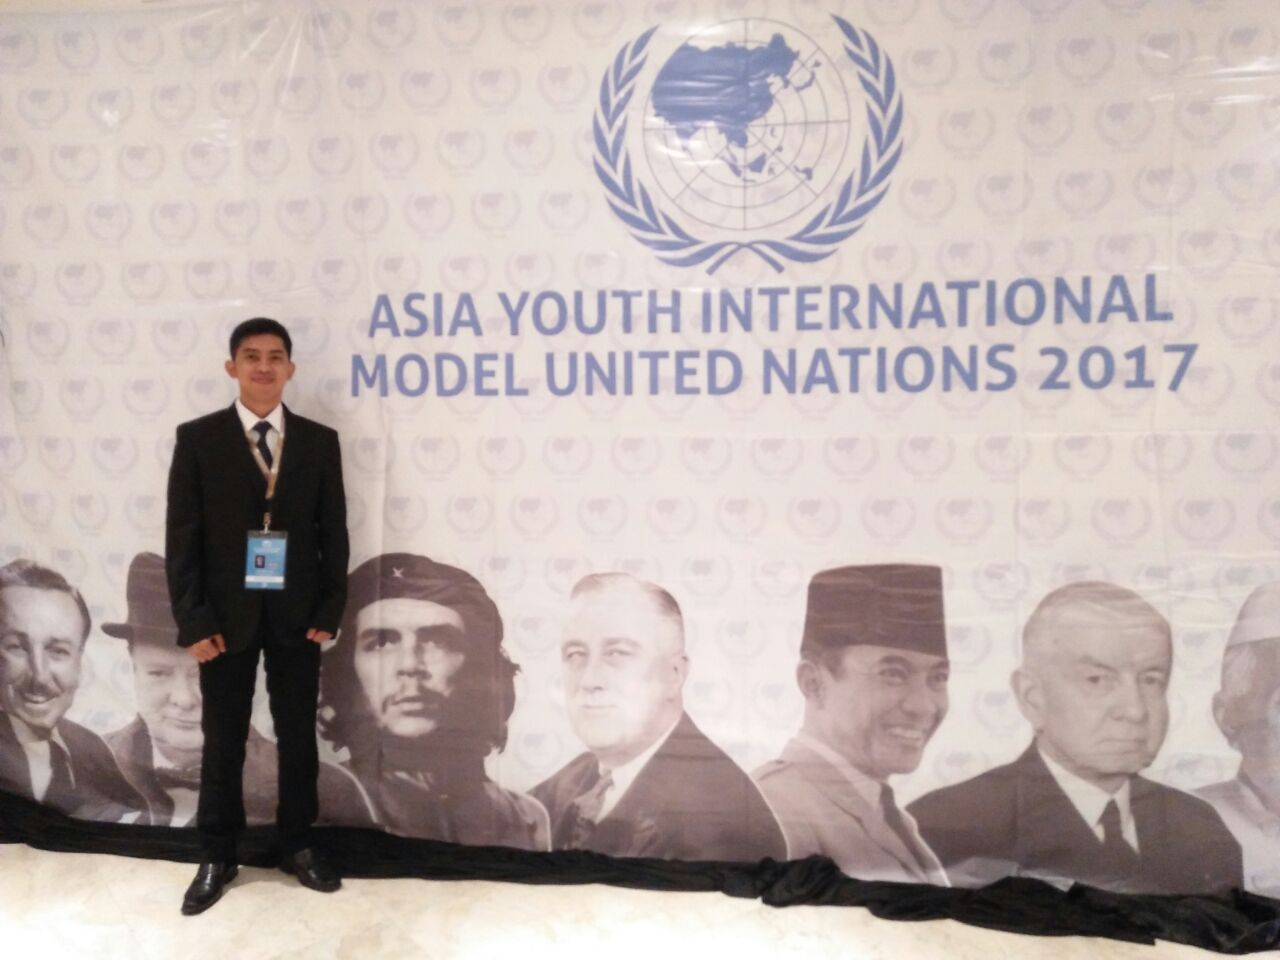 MAHASANTRI PBSB UPI HADIRI ASIA YOUTH INTERNATIONAL MODEL UNITED NATION 2017 DI MALAYSIA